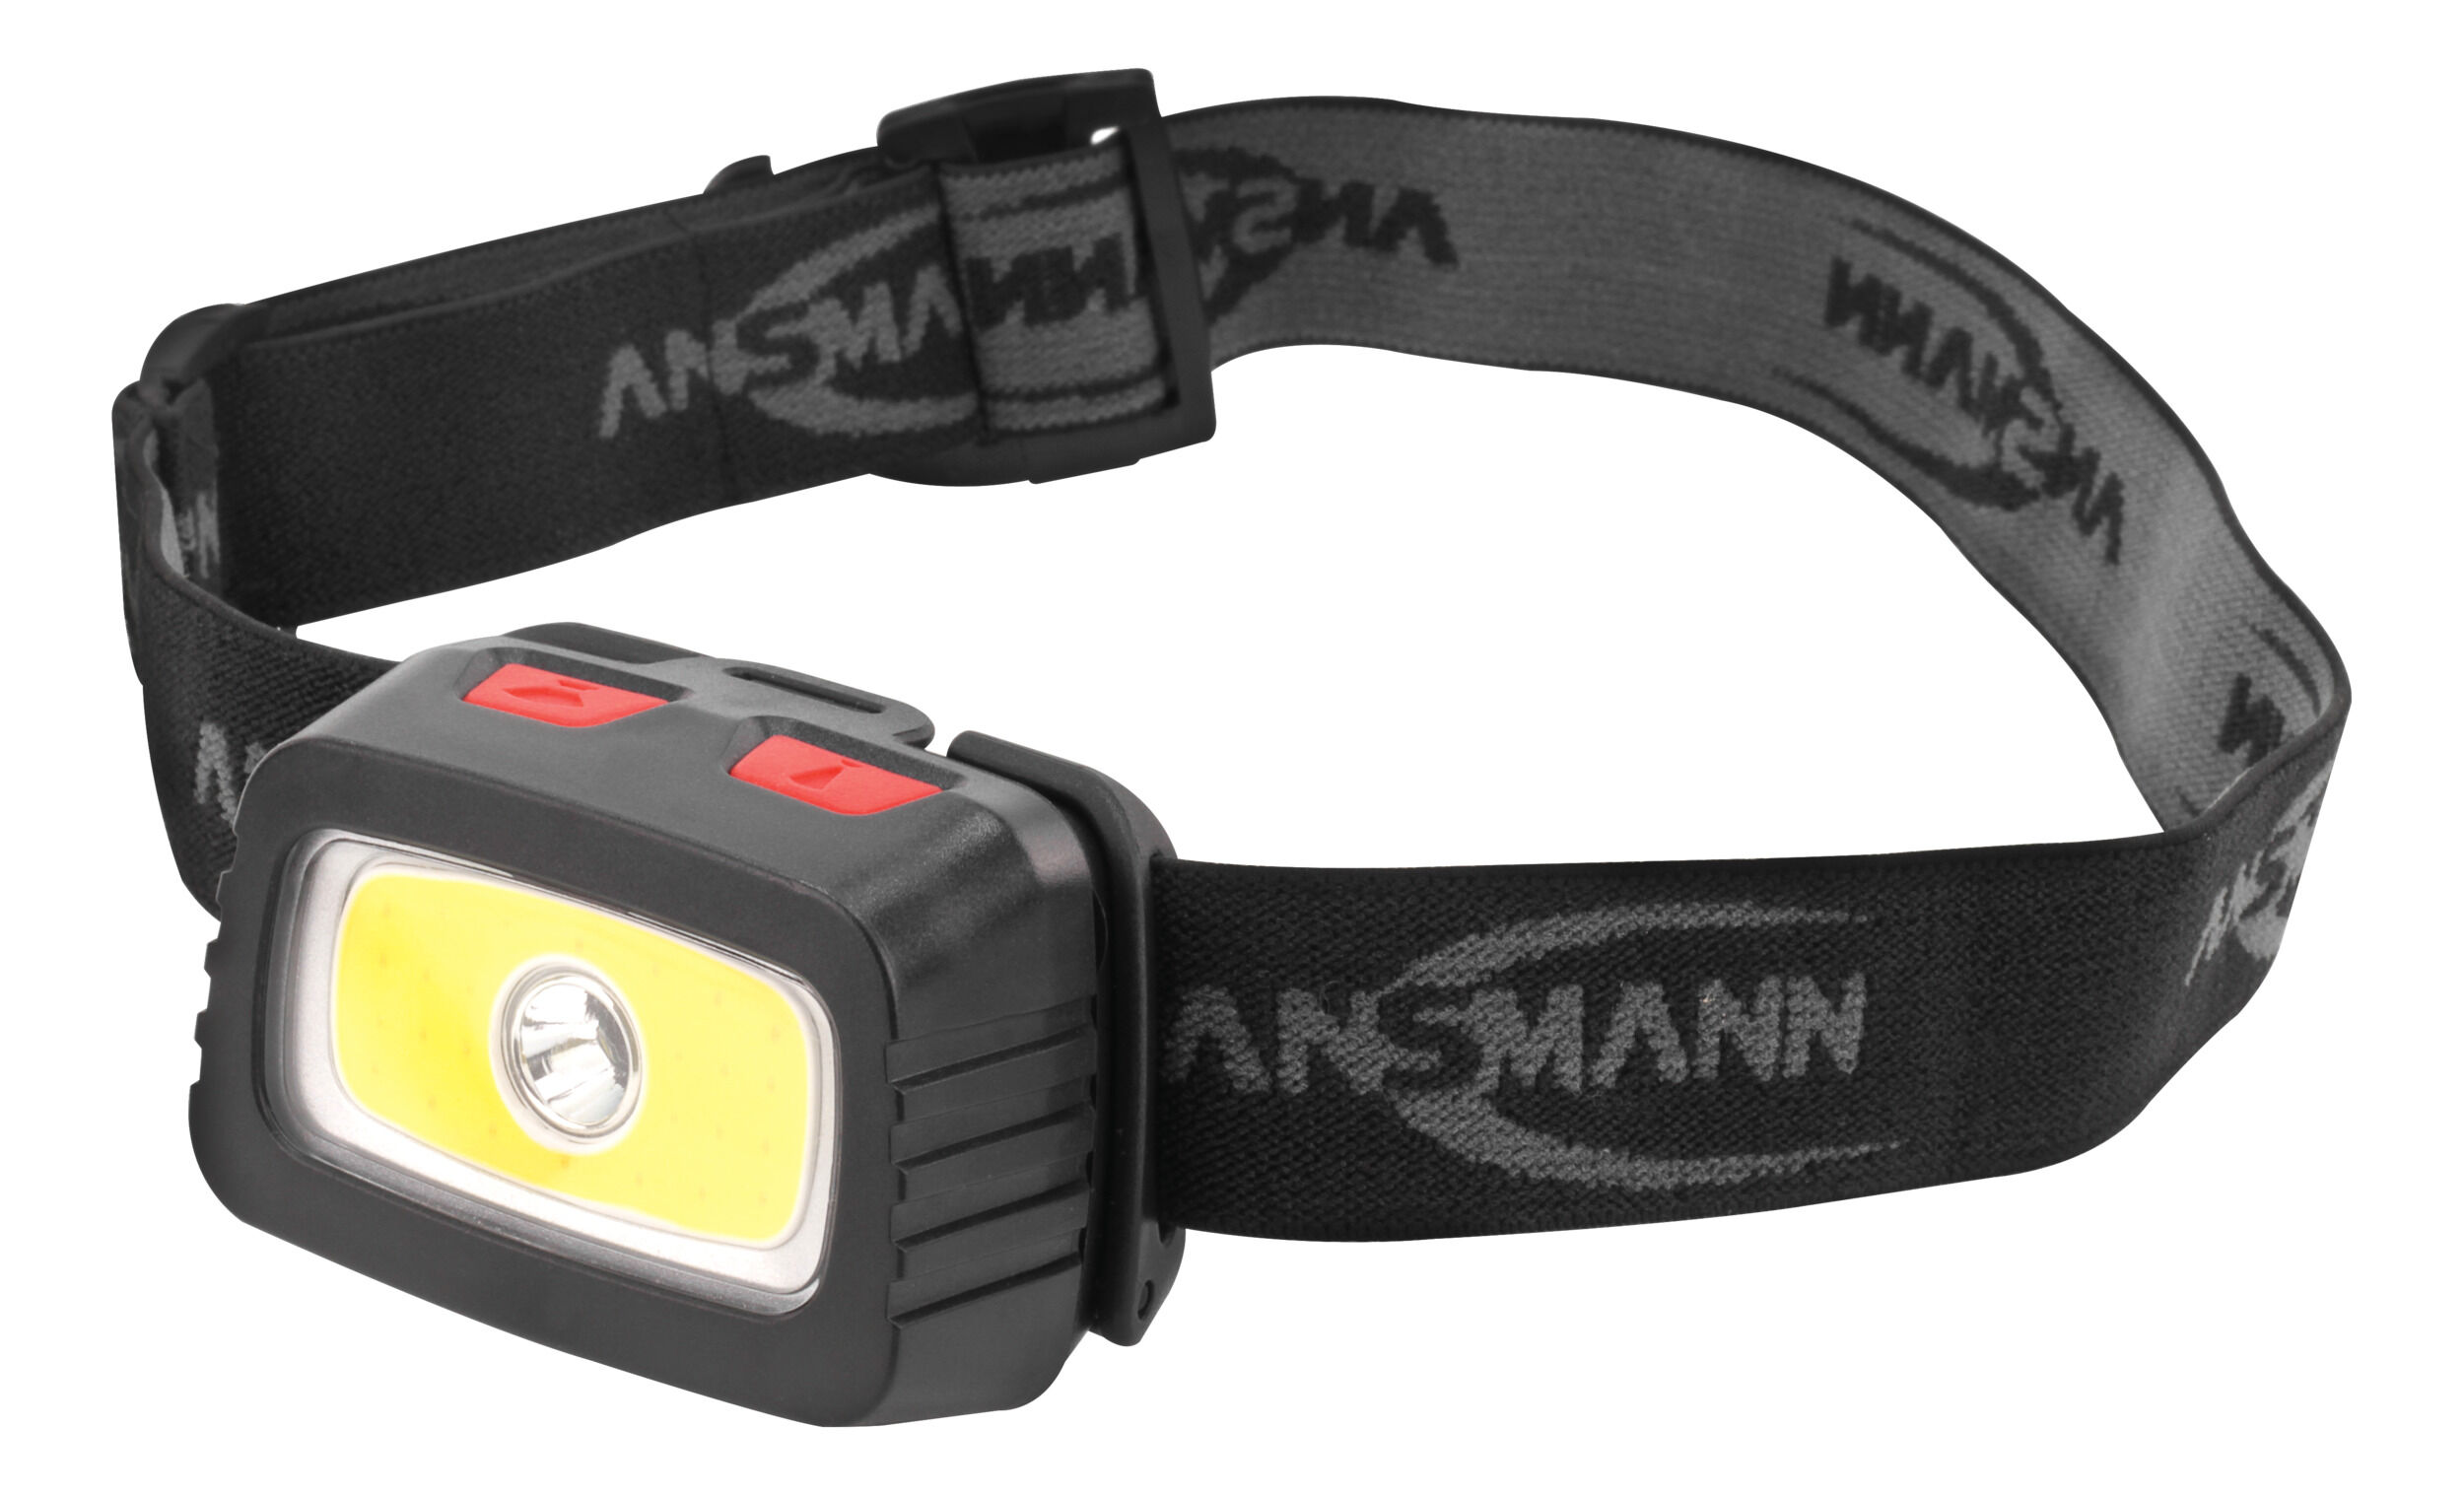 ANSMANN LED Stirnlampe – breite Ausleuchtung dank 3W COB LED Technik,